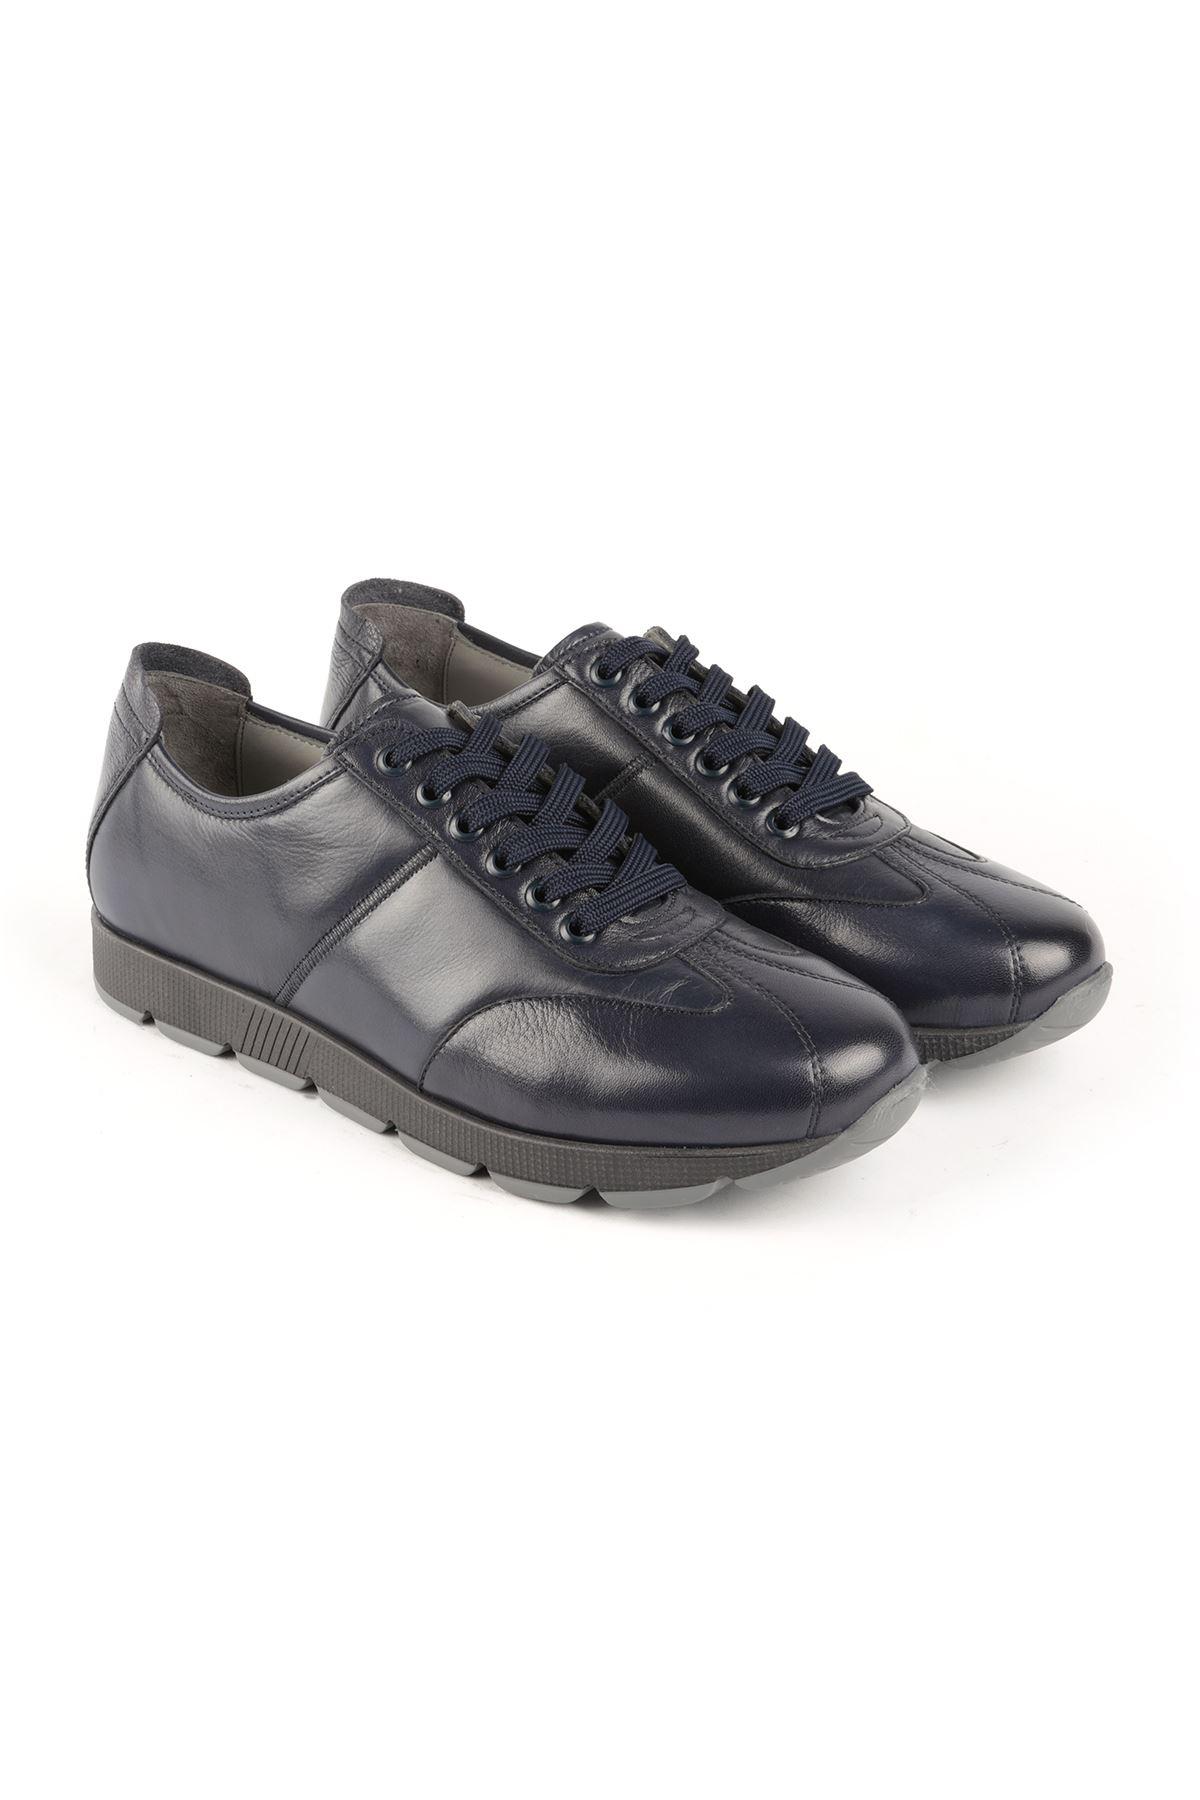 Libero L3500 Lacivert Spor Ayakkabı